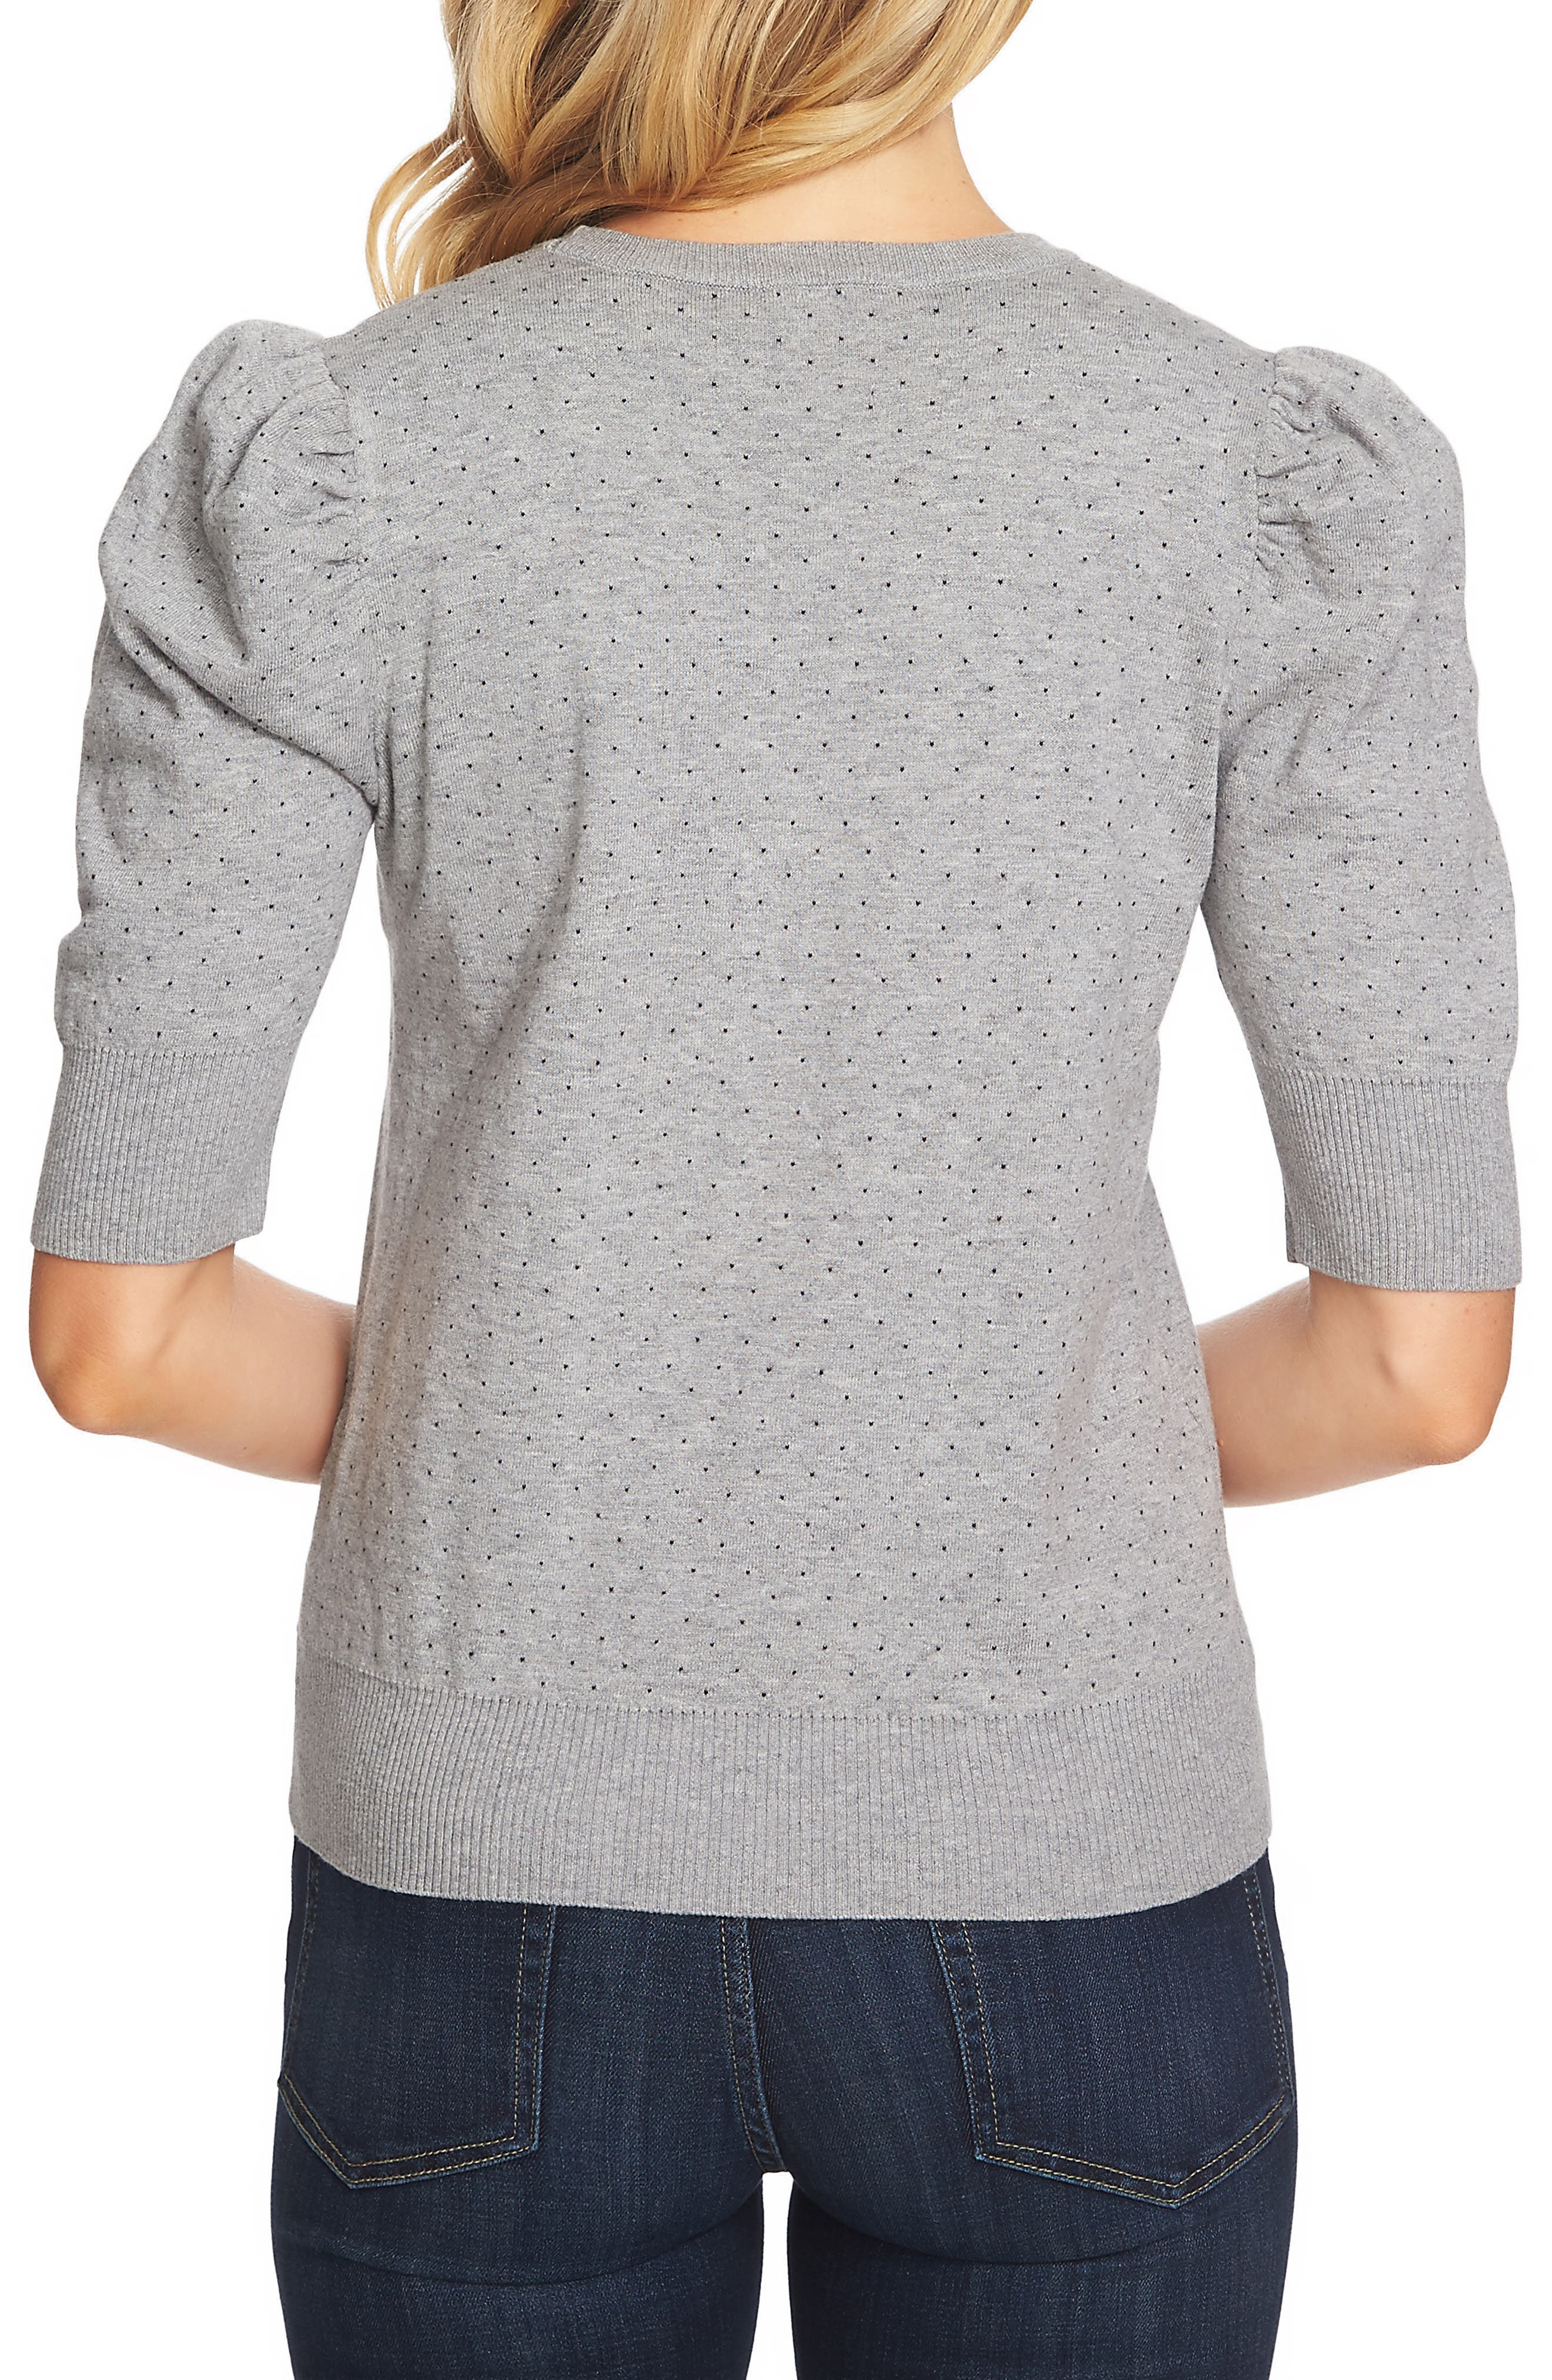 Puffed Sleeve Jacquard Sweater,                             Alternate thumbnail 2, color,                             LIGHT HEATHER GREY